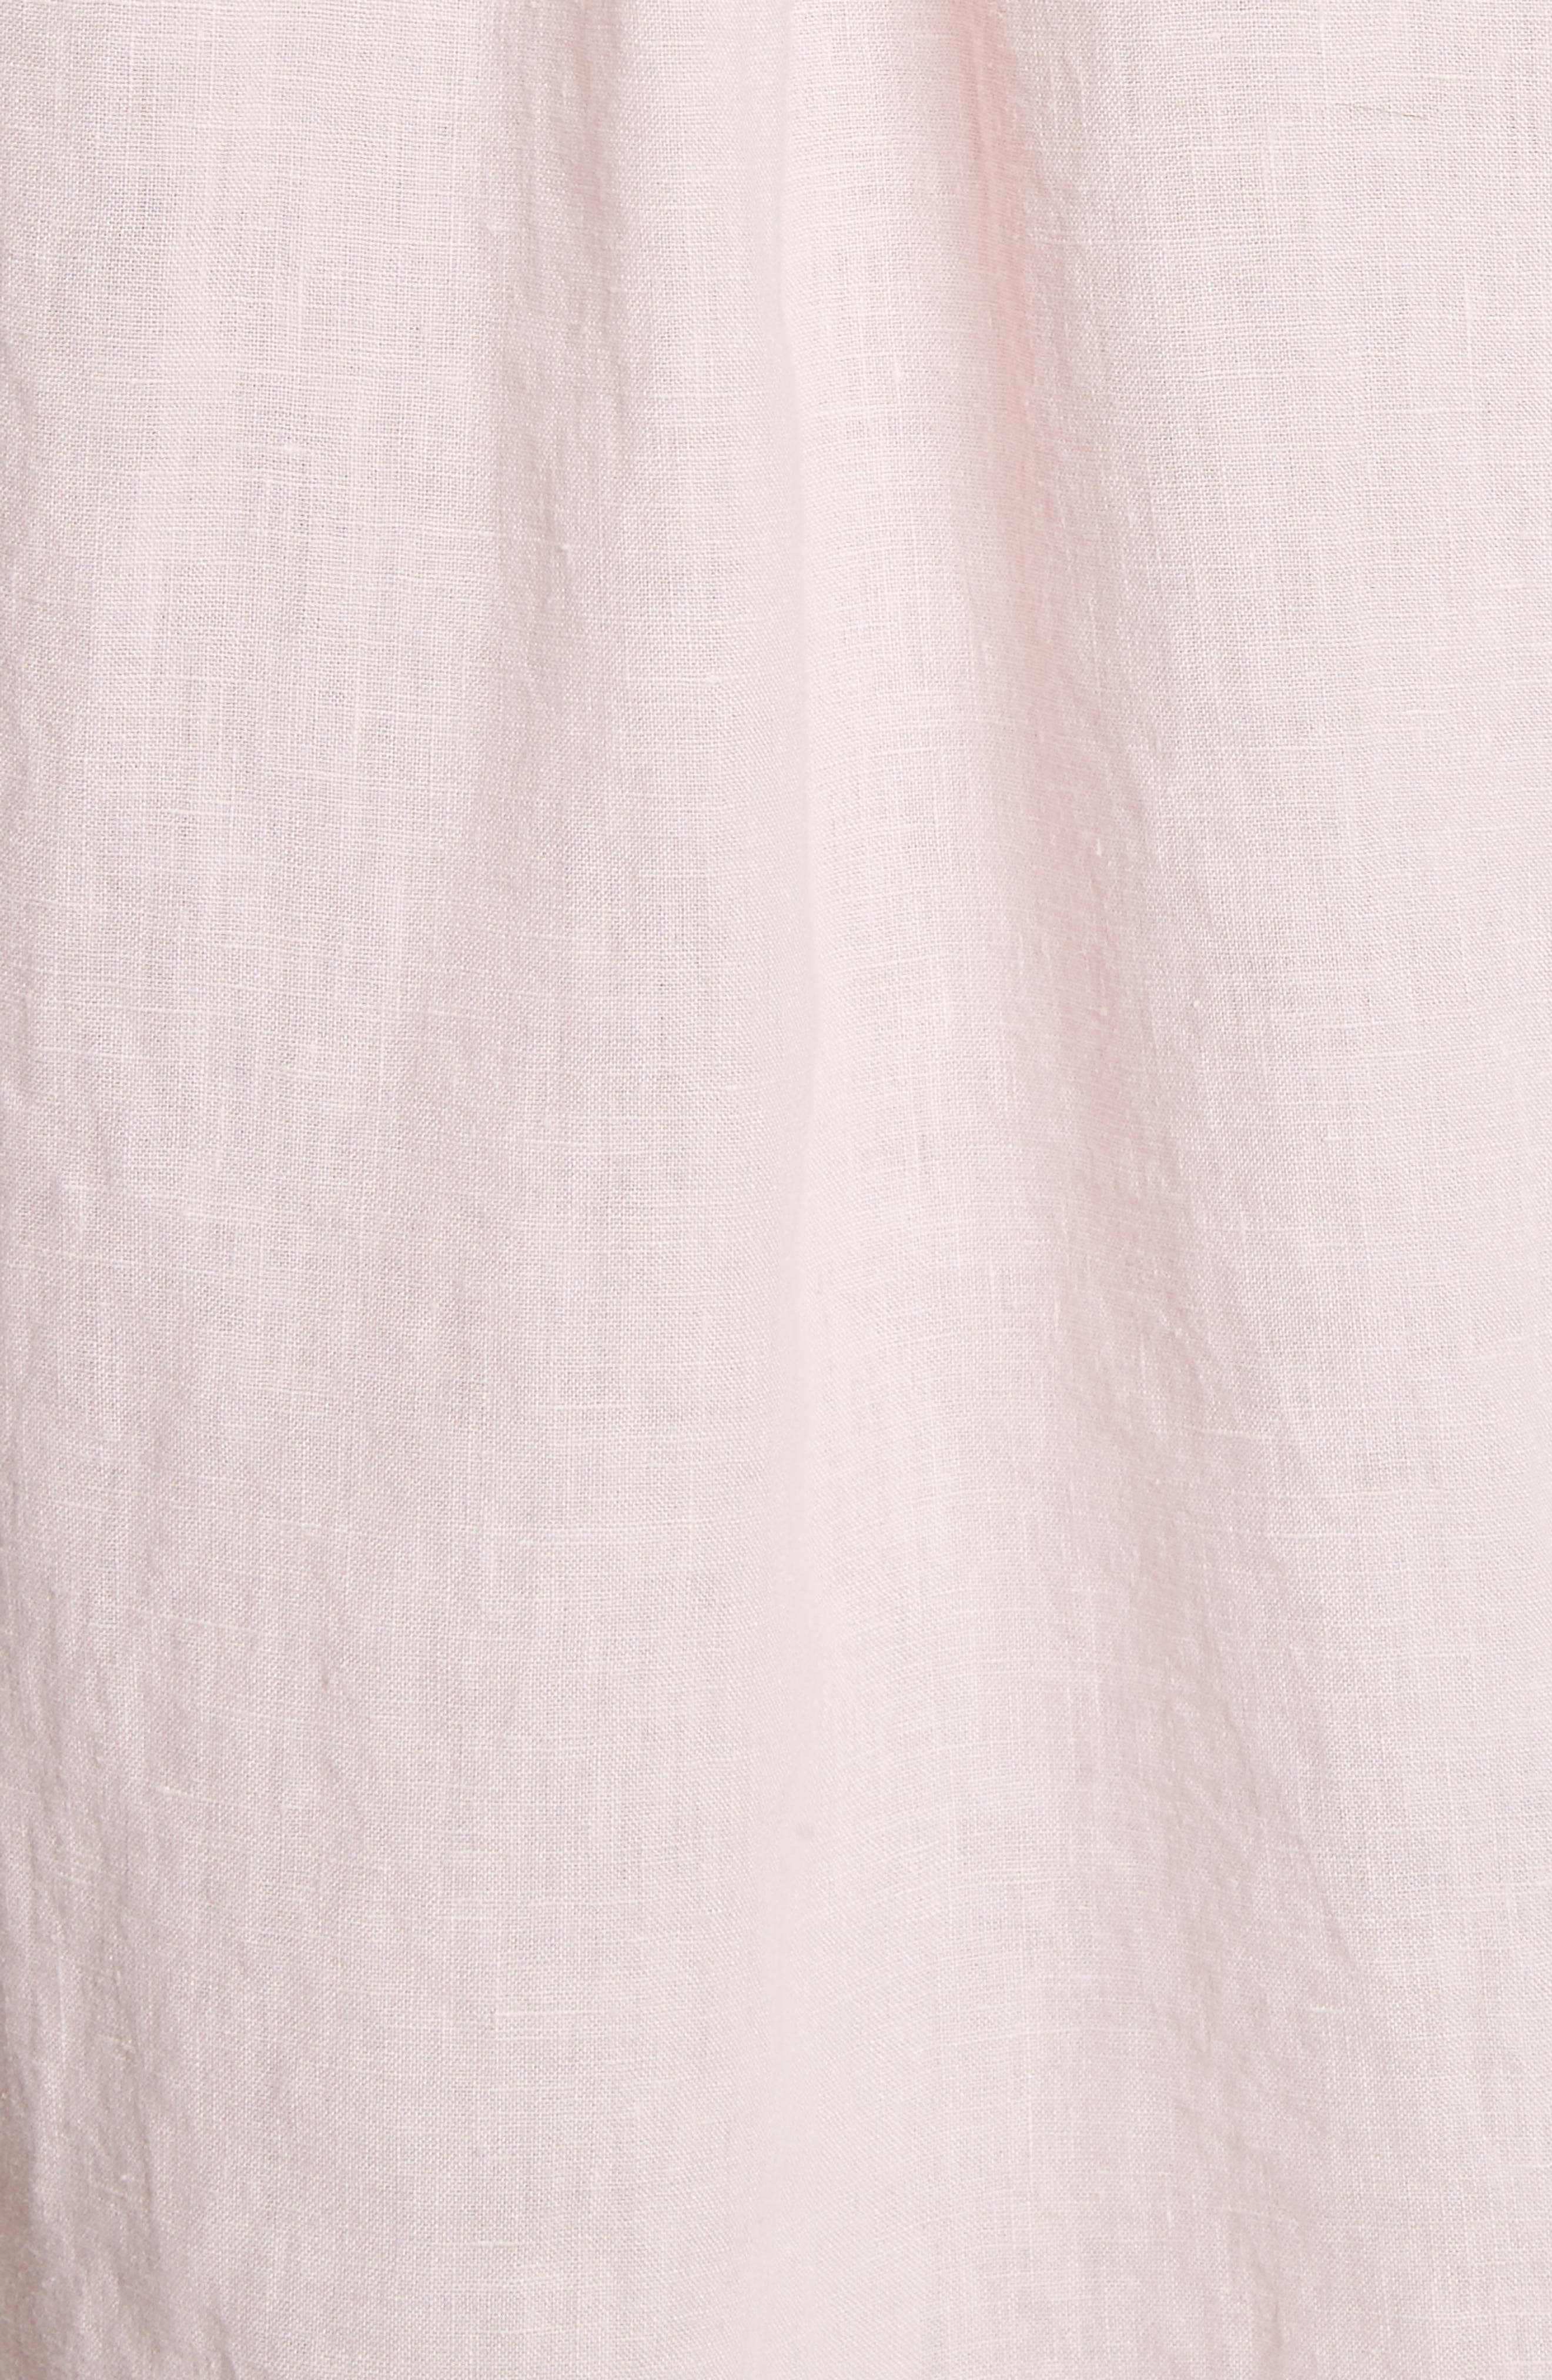 Linen Woven Shirt,                             Alternate thumbnail 5, color,                             650